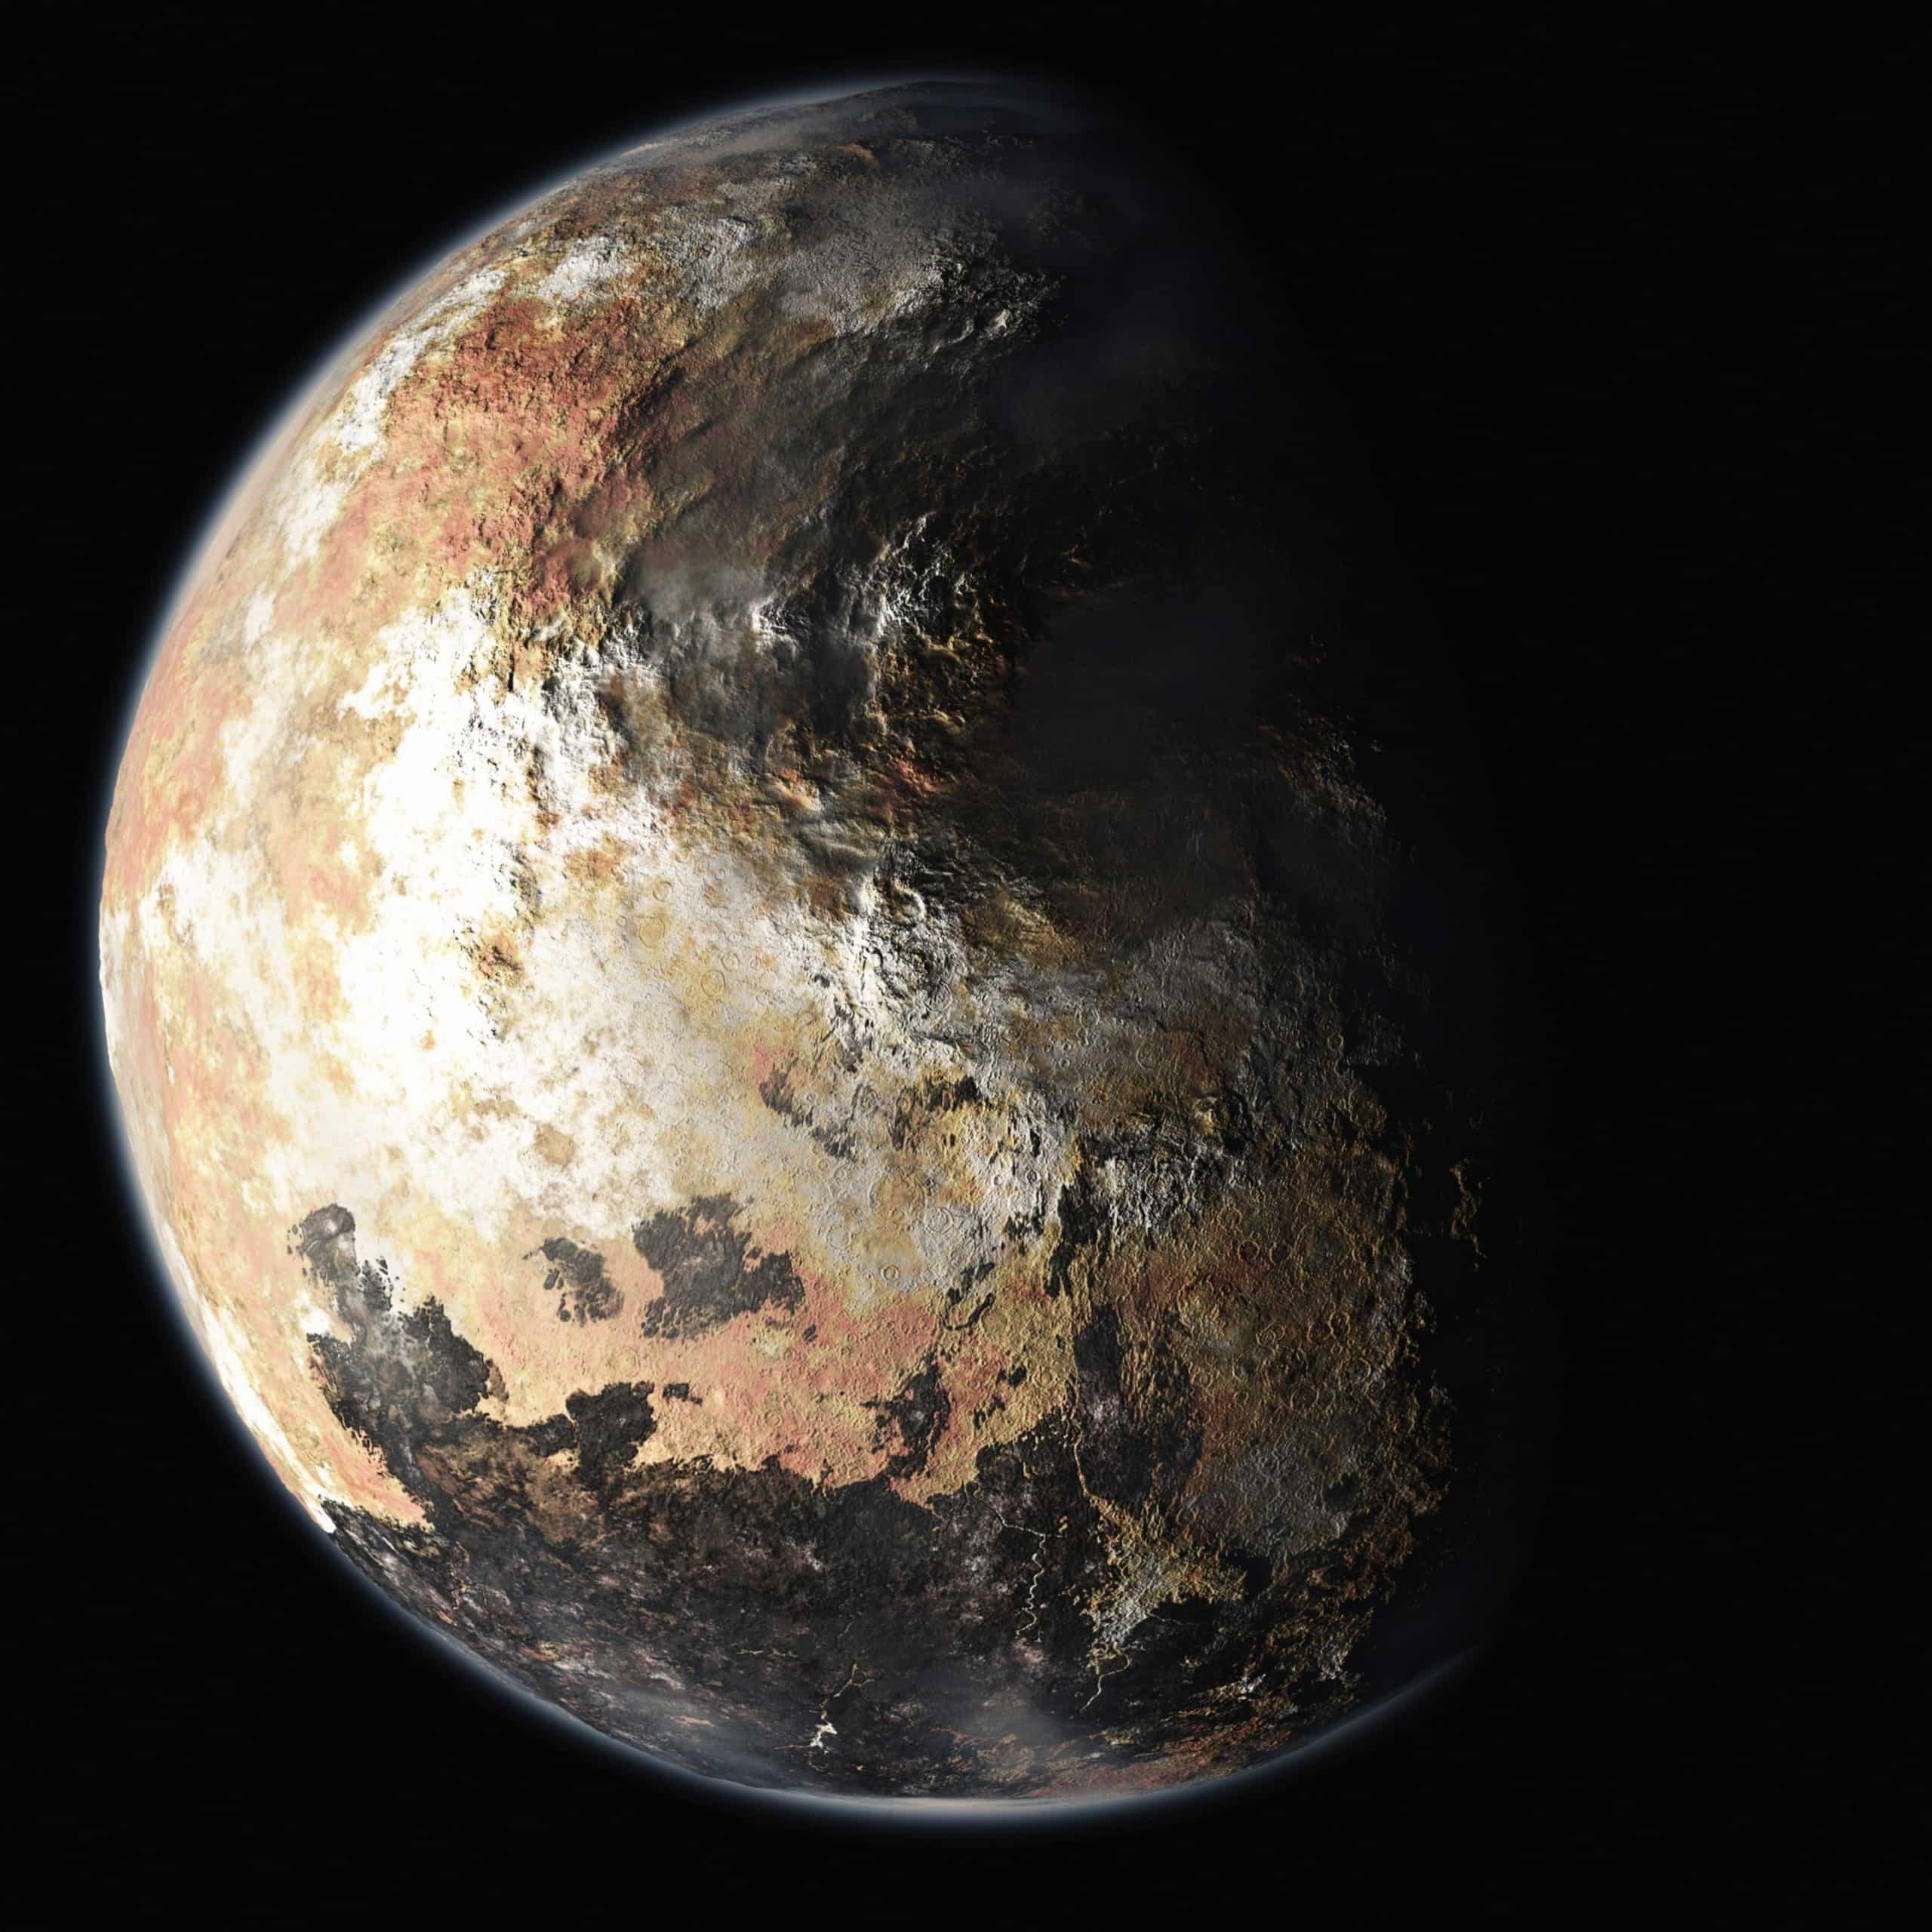 Плутон в 1 доме у мужчины